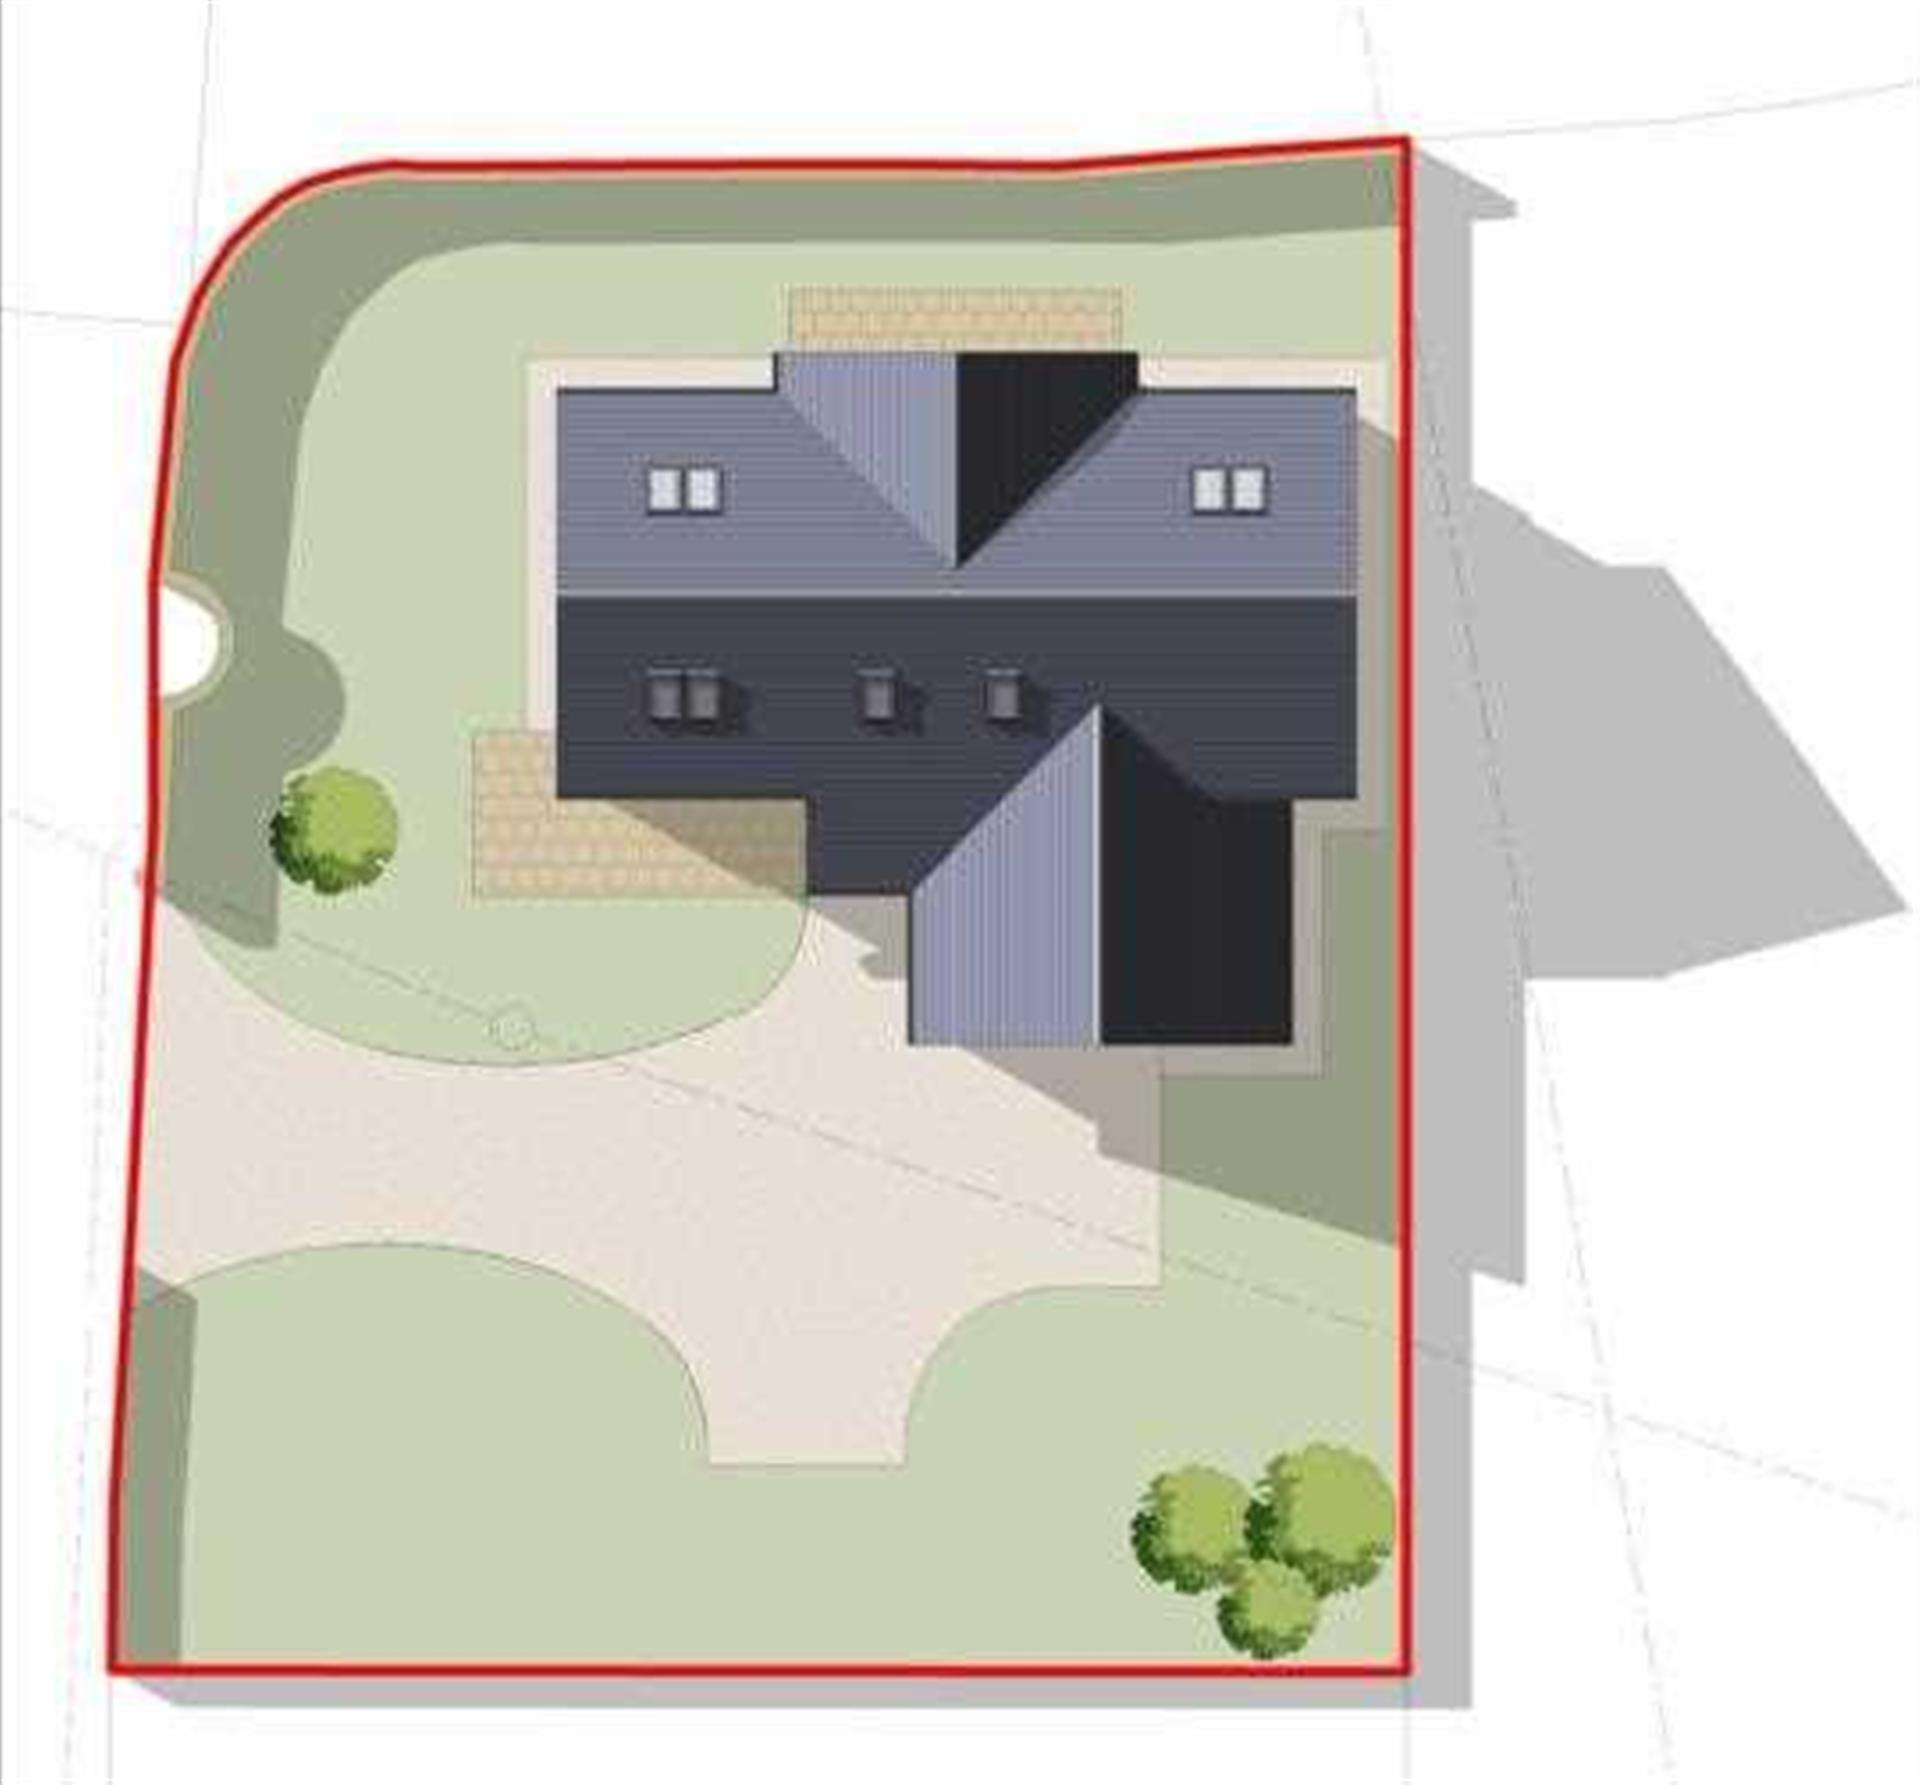 5 Bedroom Detached House For Sale - Plan